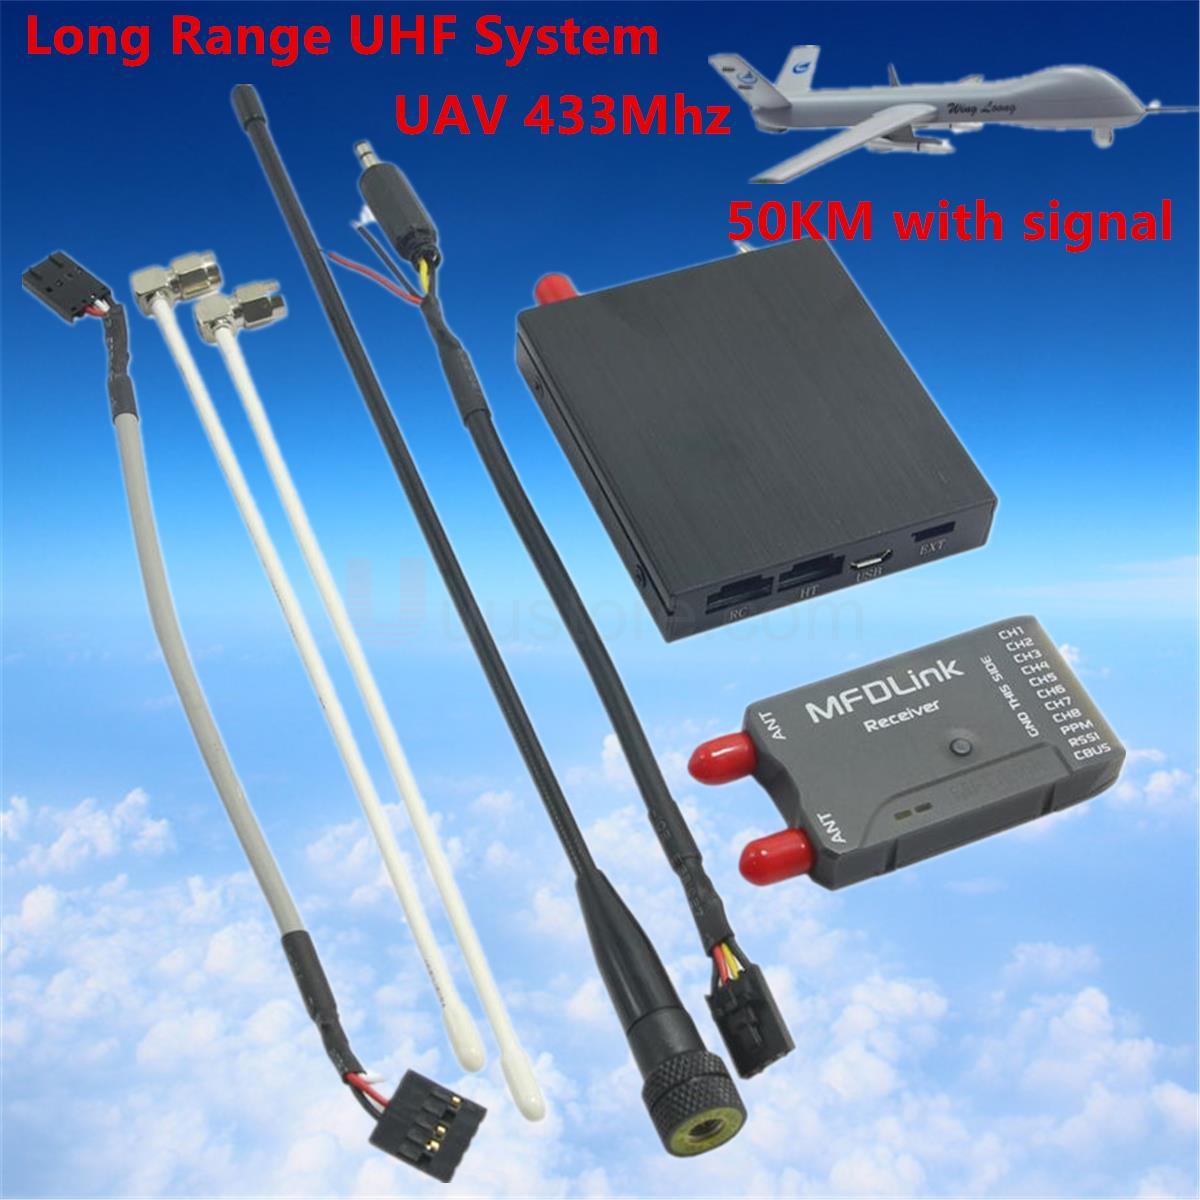 50KM Long Range MFDLink Rlink 433Mhz 16CH 1W RC FPV UHF System Transmitter w 8 Channel